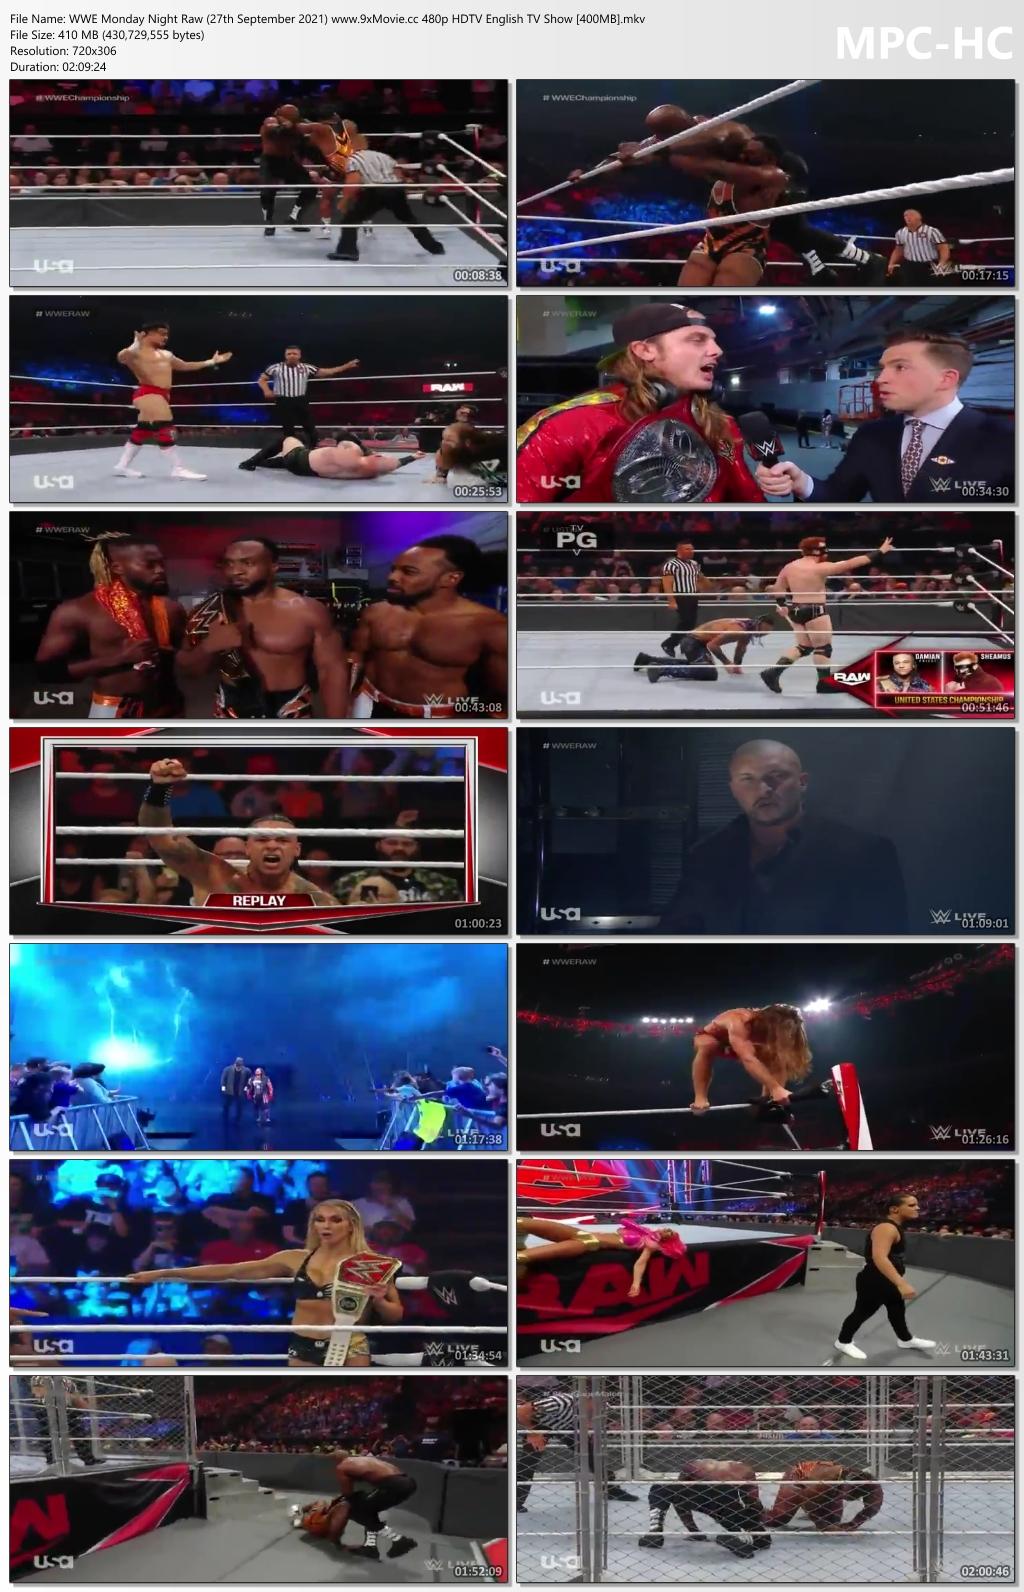 WWE-Monday-Night-Raw-27th-September-2021-www-9x-Movie-cc-480p-HDTV-English-TV-Show-400-MB-mkv